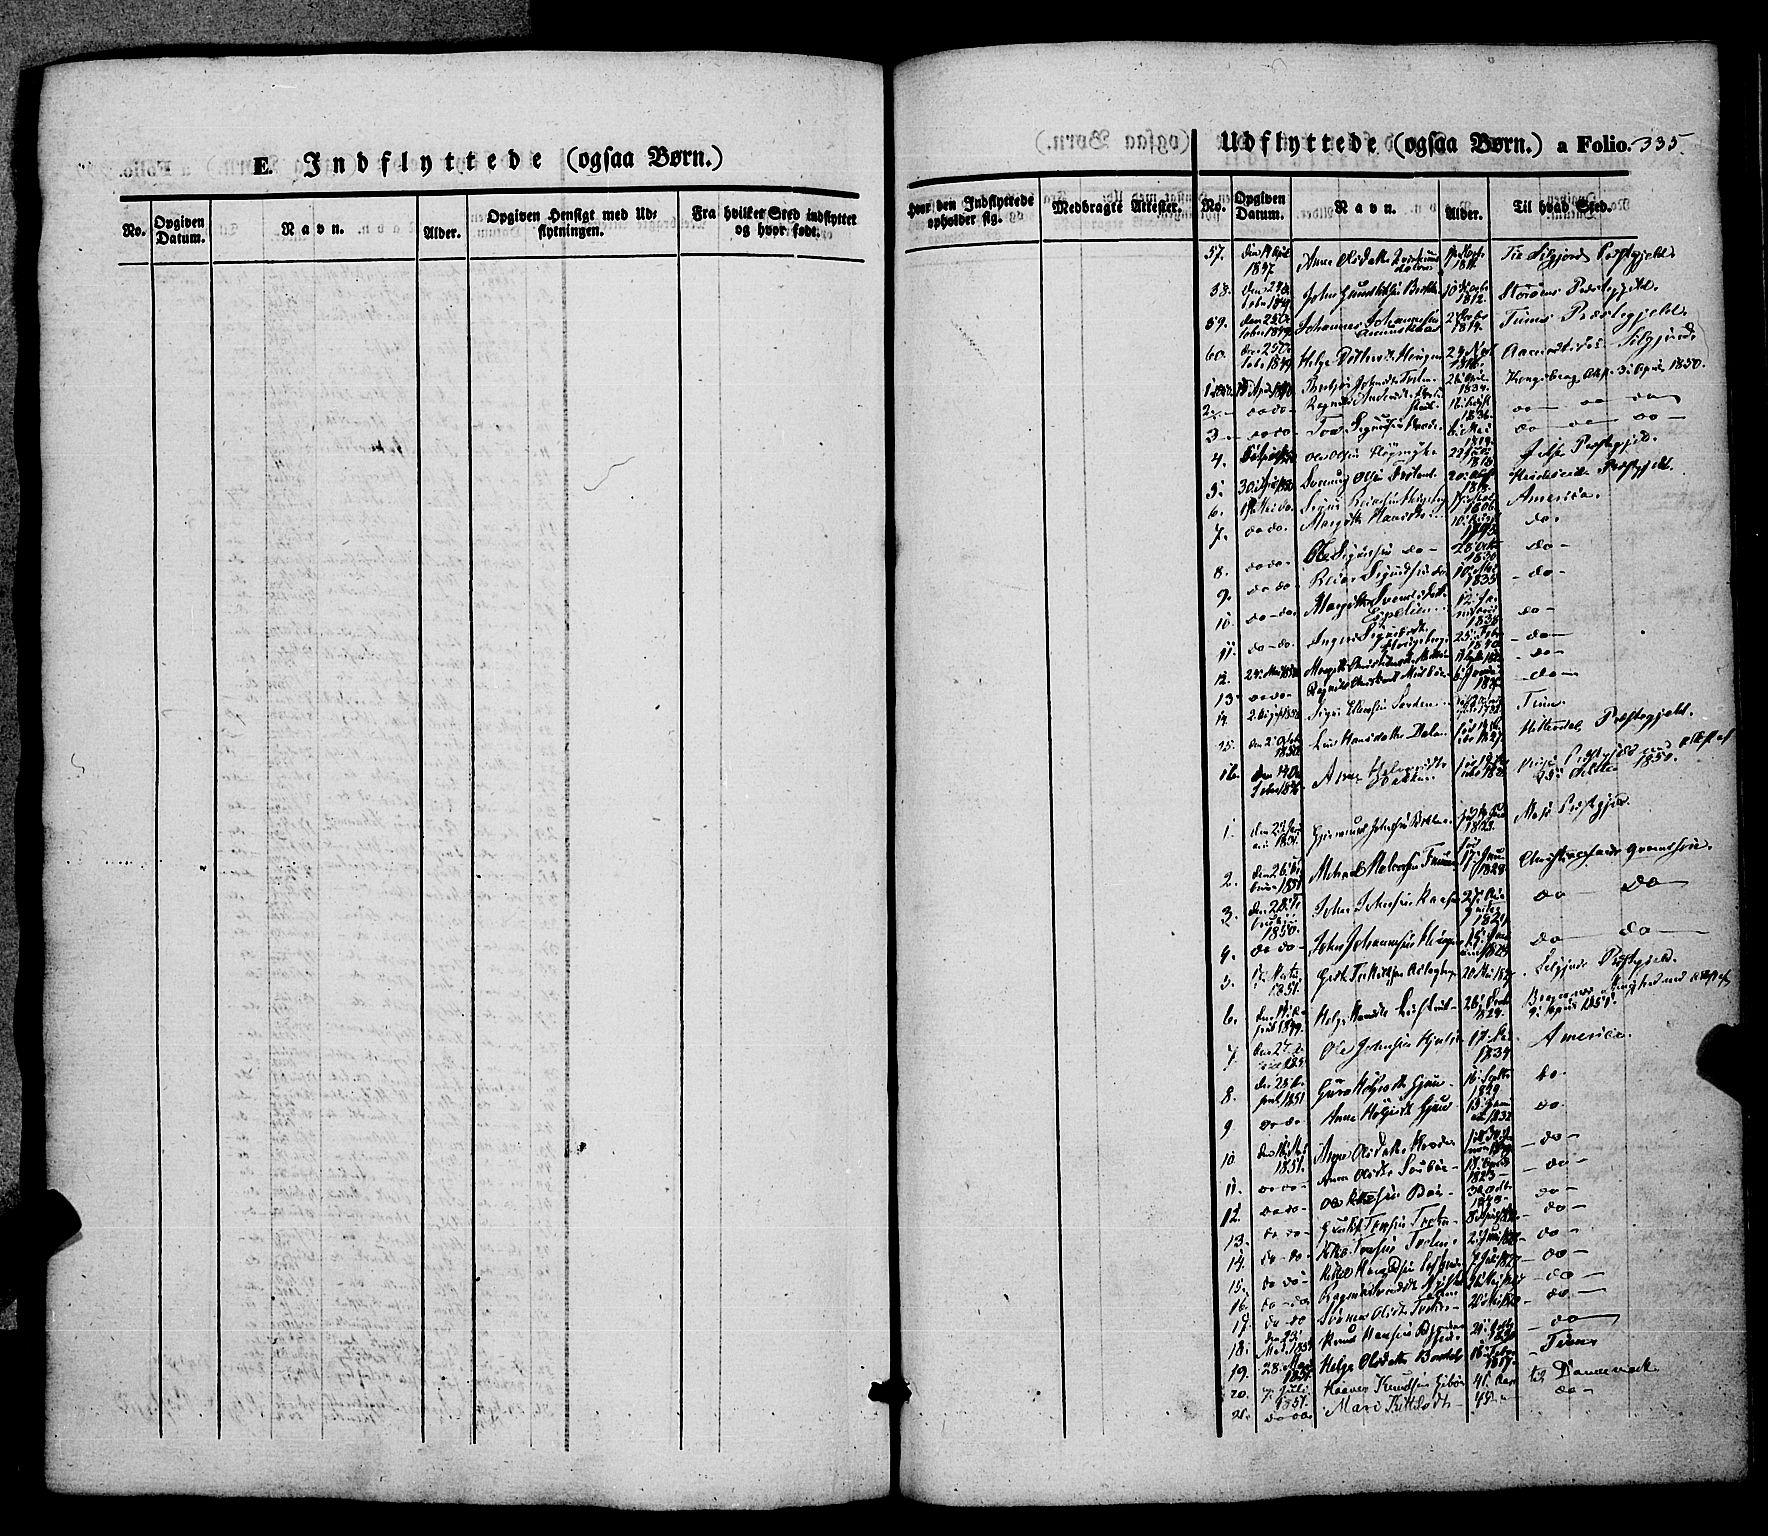 SAKO, Hjartdal kirkebøker, F/Fa/L0008: Ministerialbok nr. I 8, 1844-1859, s. 335